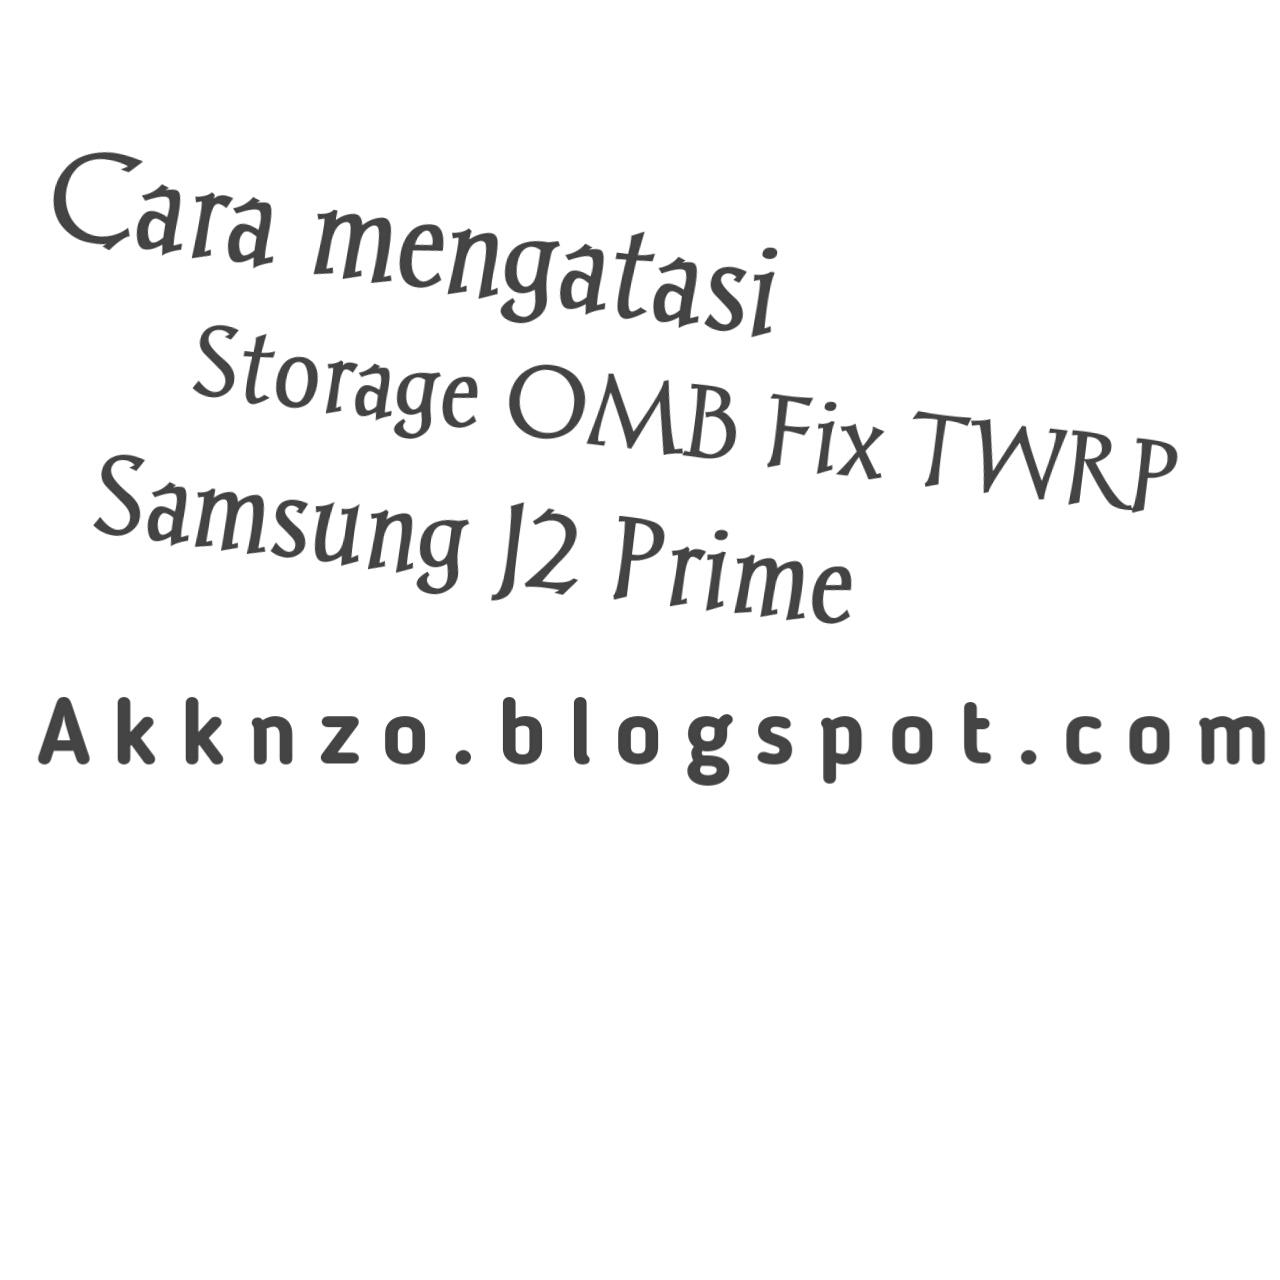 FIX TWRP] Cara Mengatasi Storage 0mb Di TWRP Samsung J2